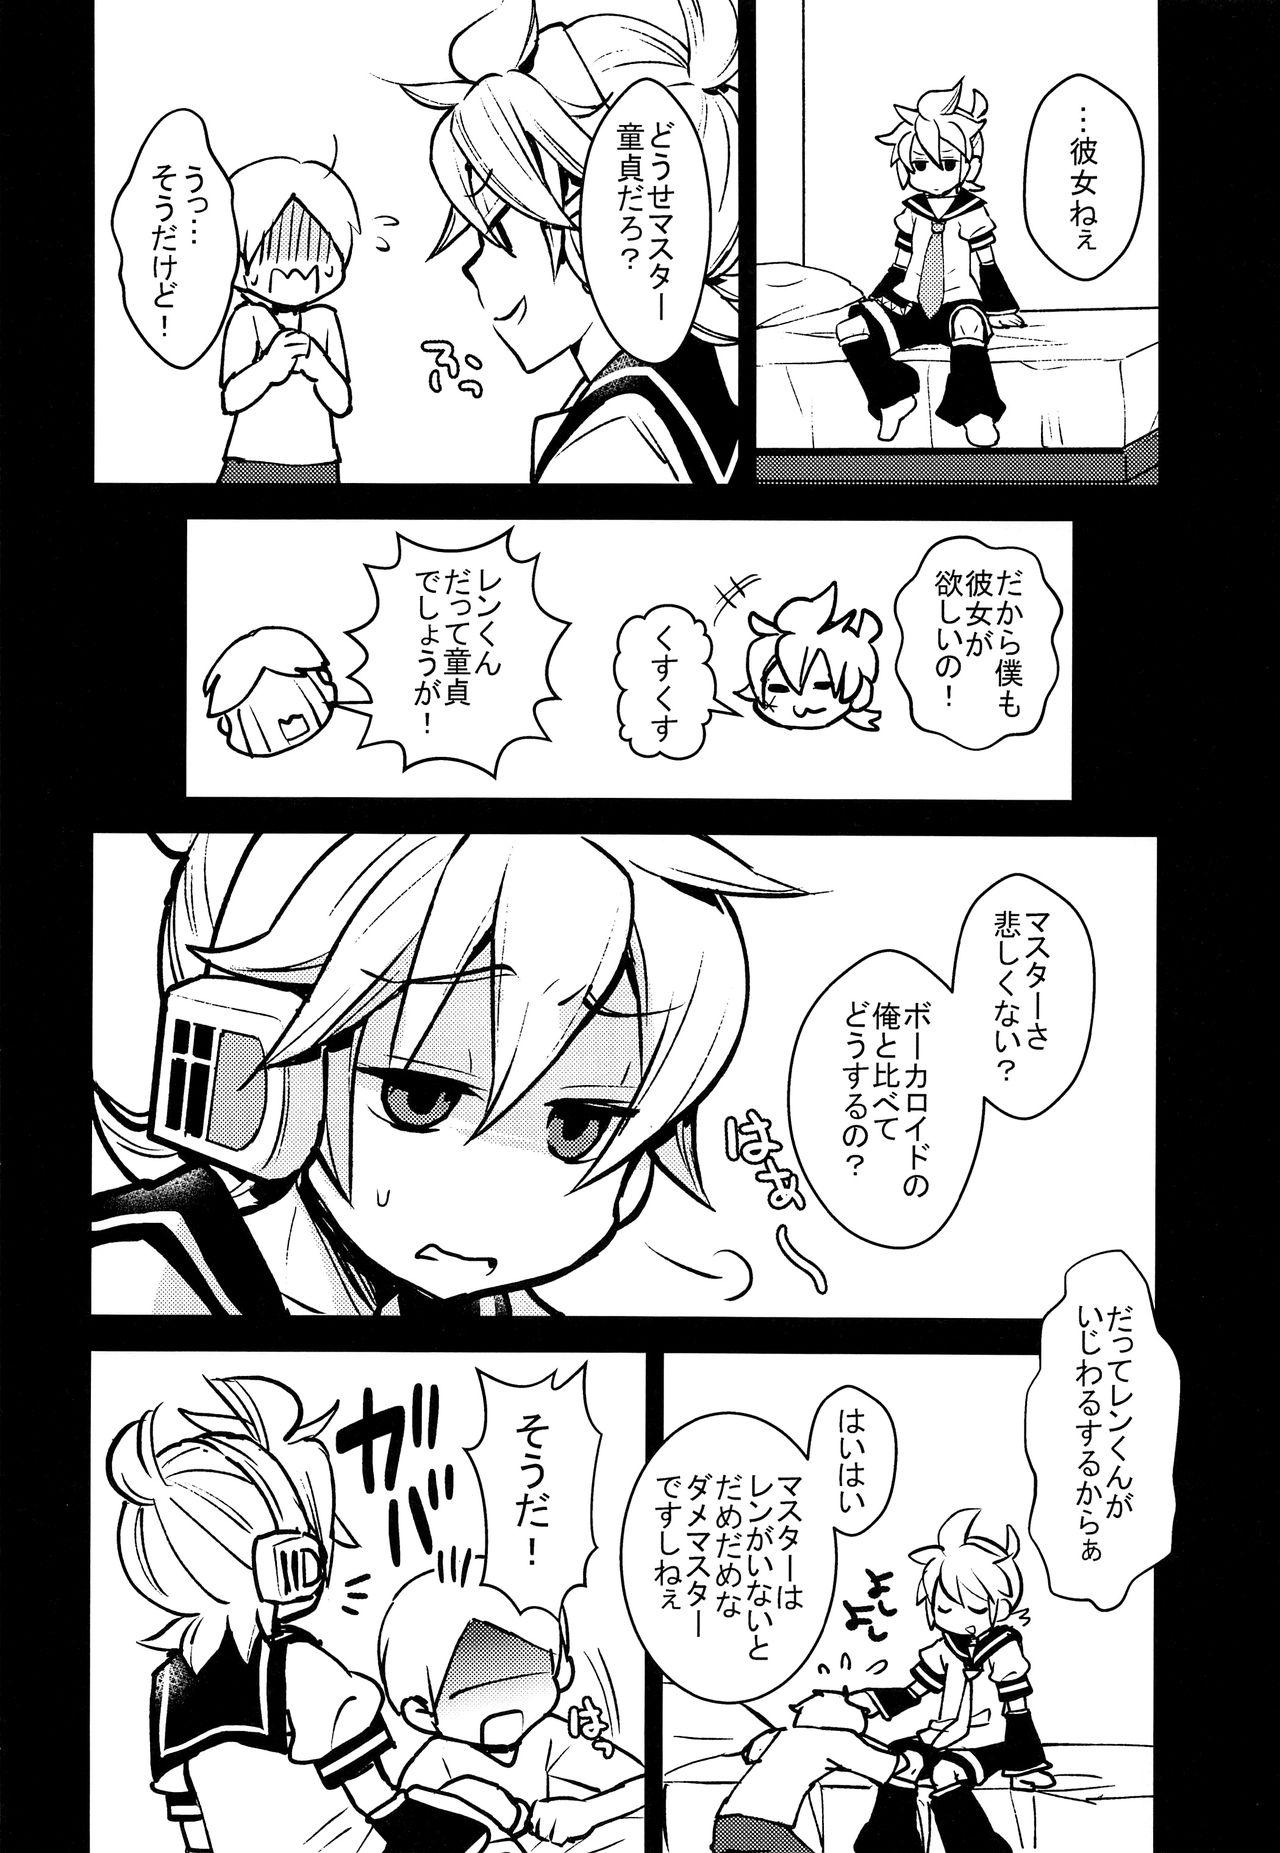 Len-kun Onegai! 6